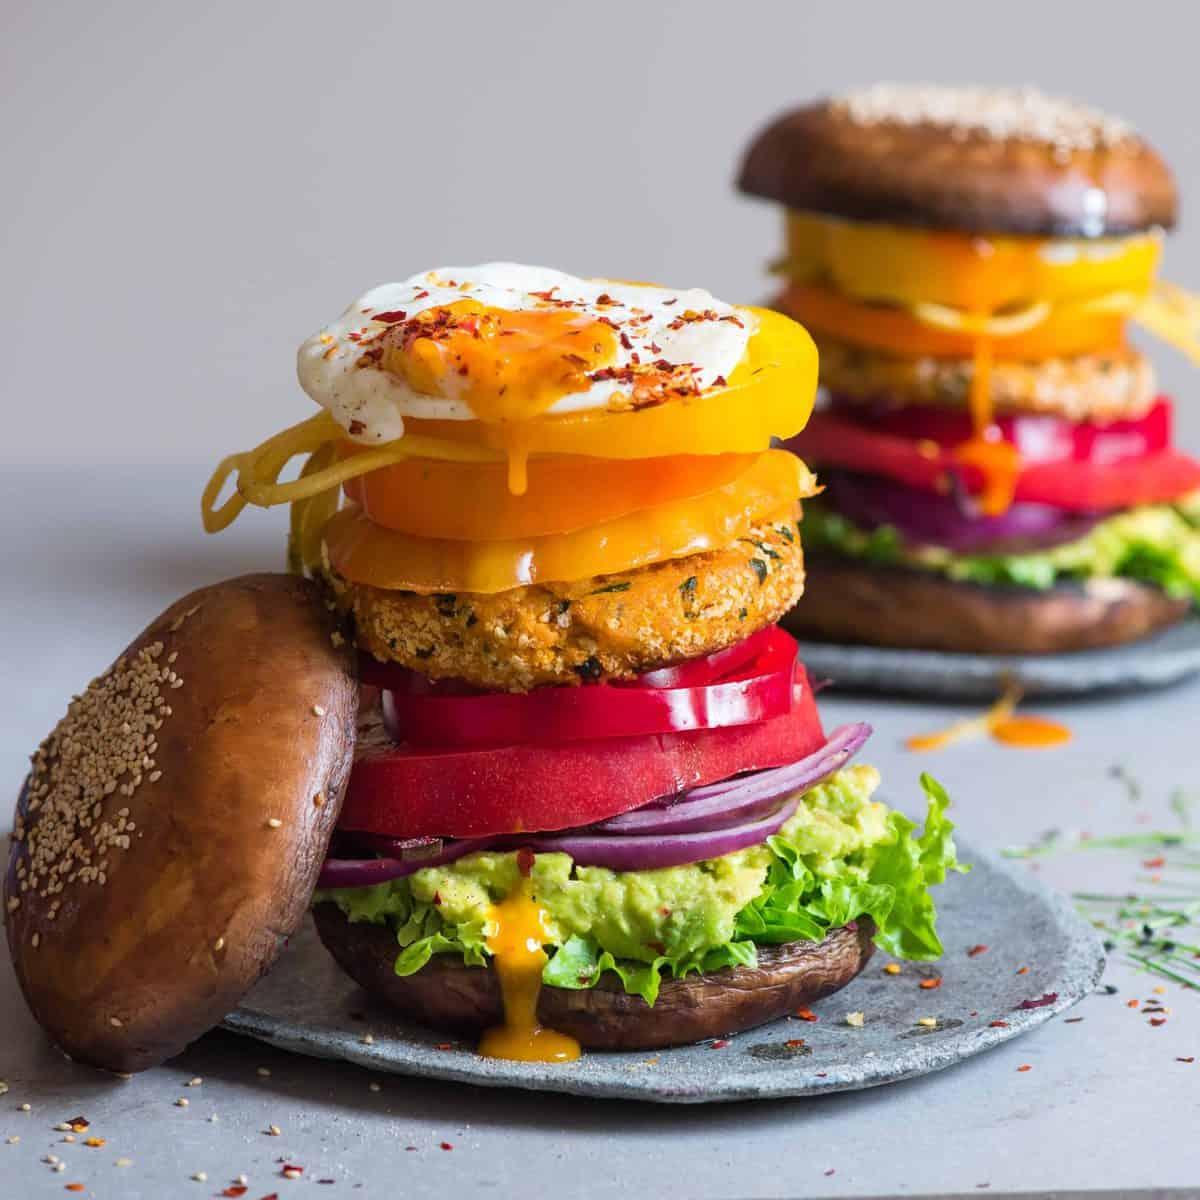 vegetarian mushroom bun burger with sweet potato patty